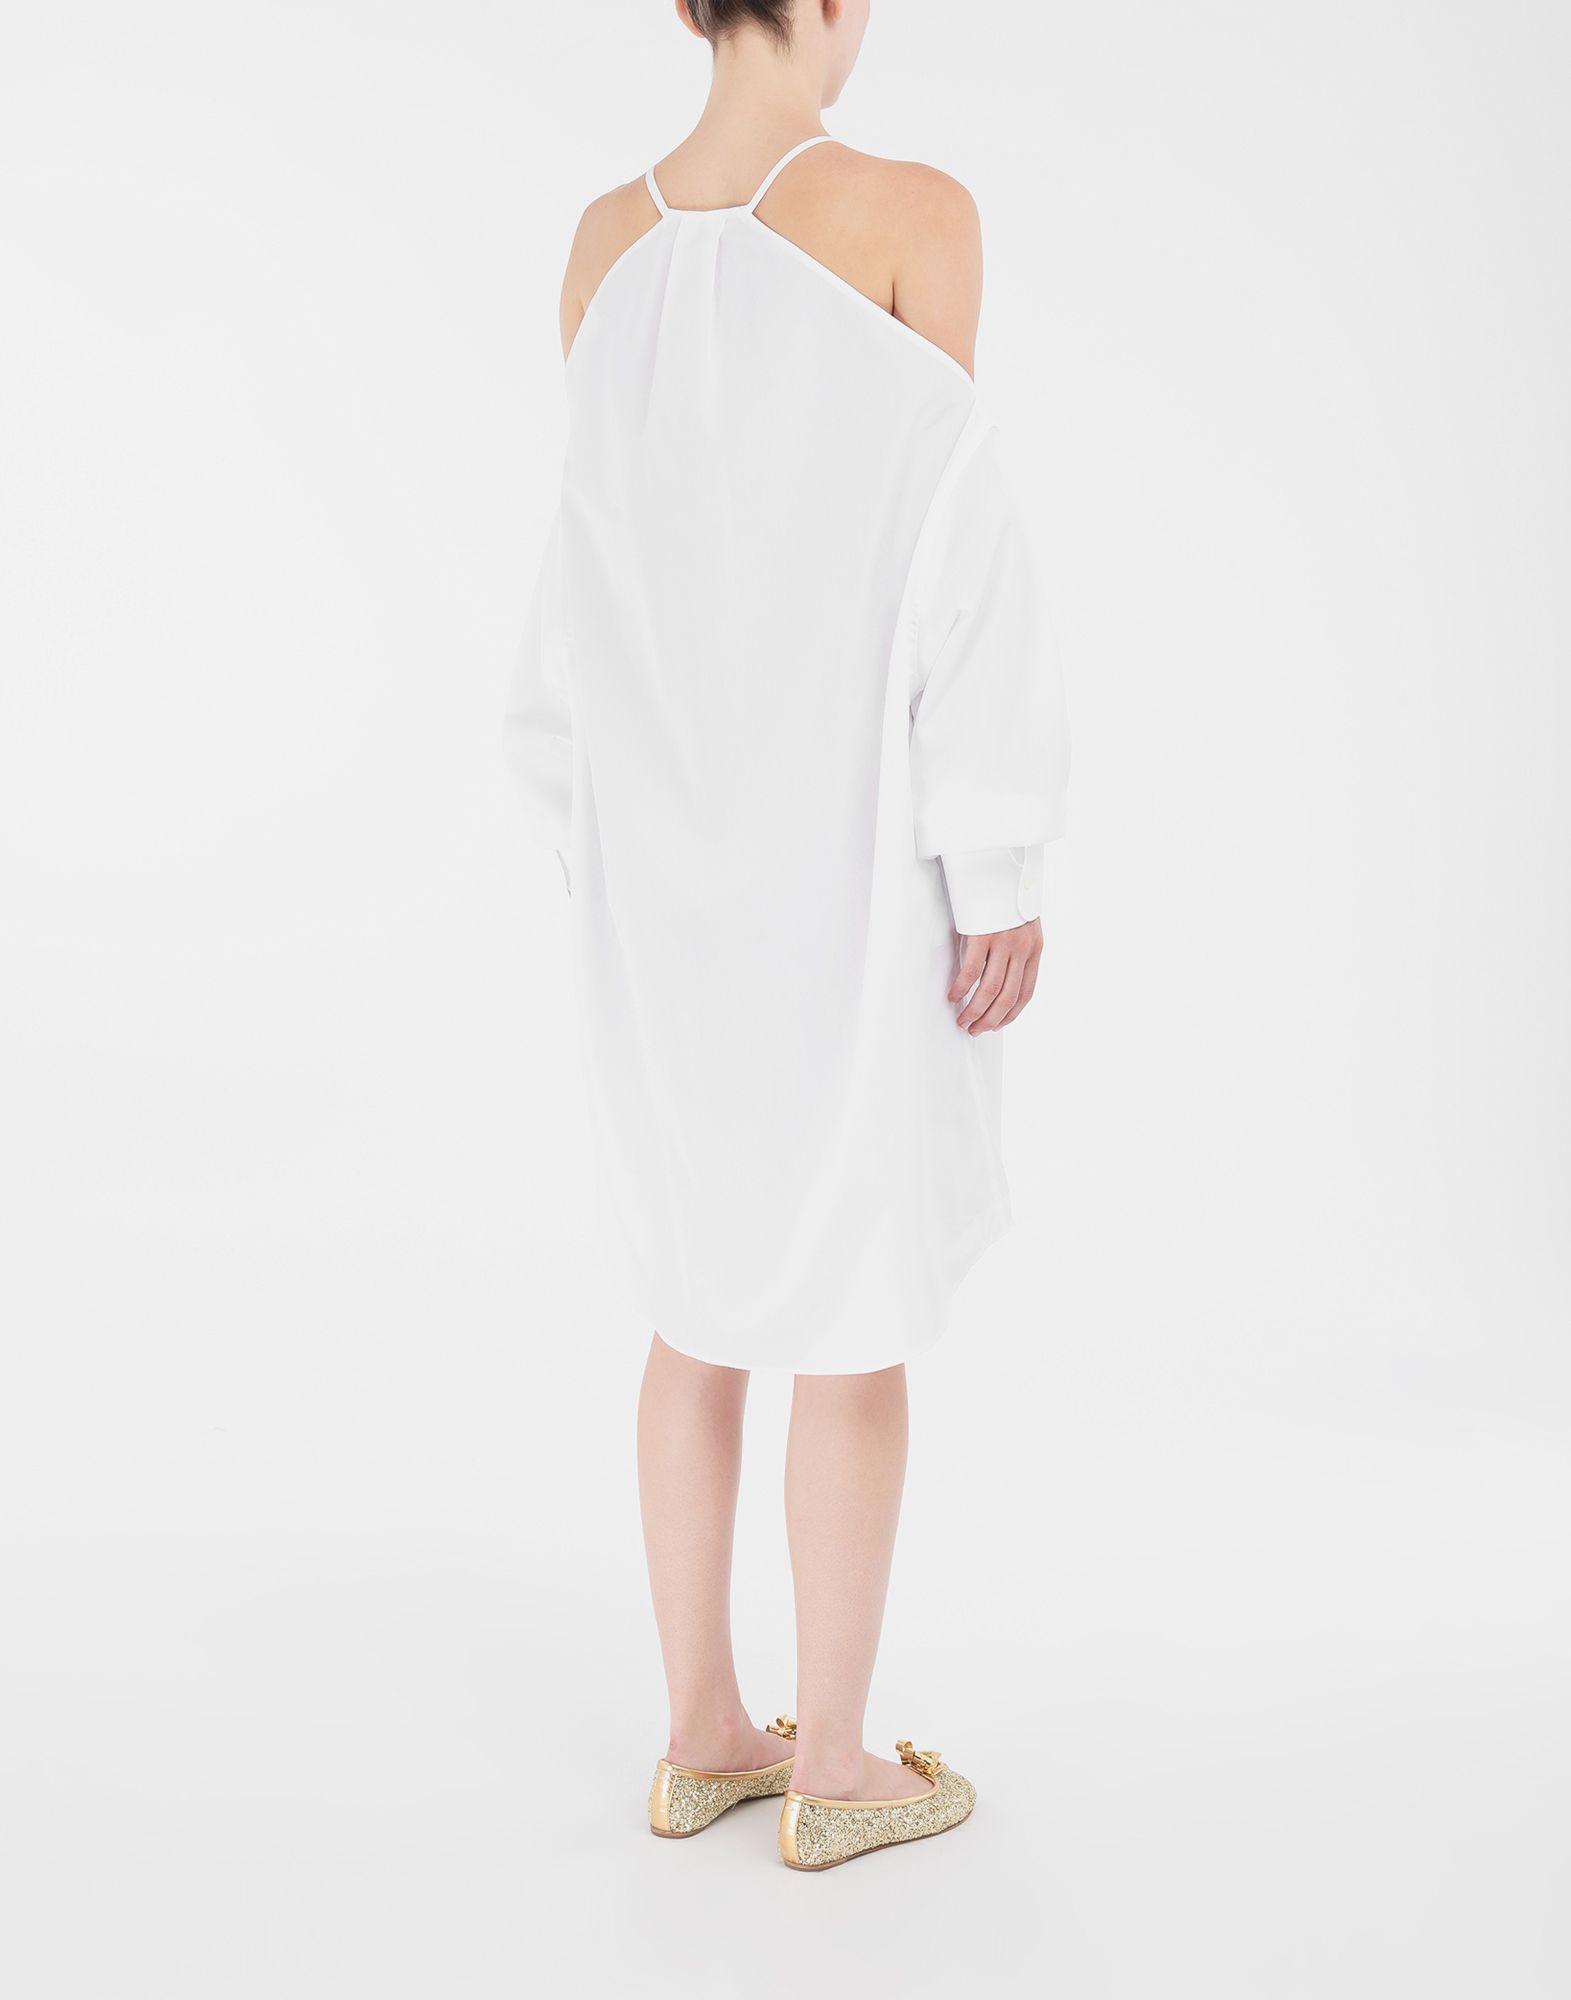 MAISON MARGIELA Multi-wear shirt Long sleeve shirt Woman e